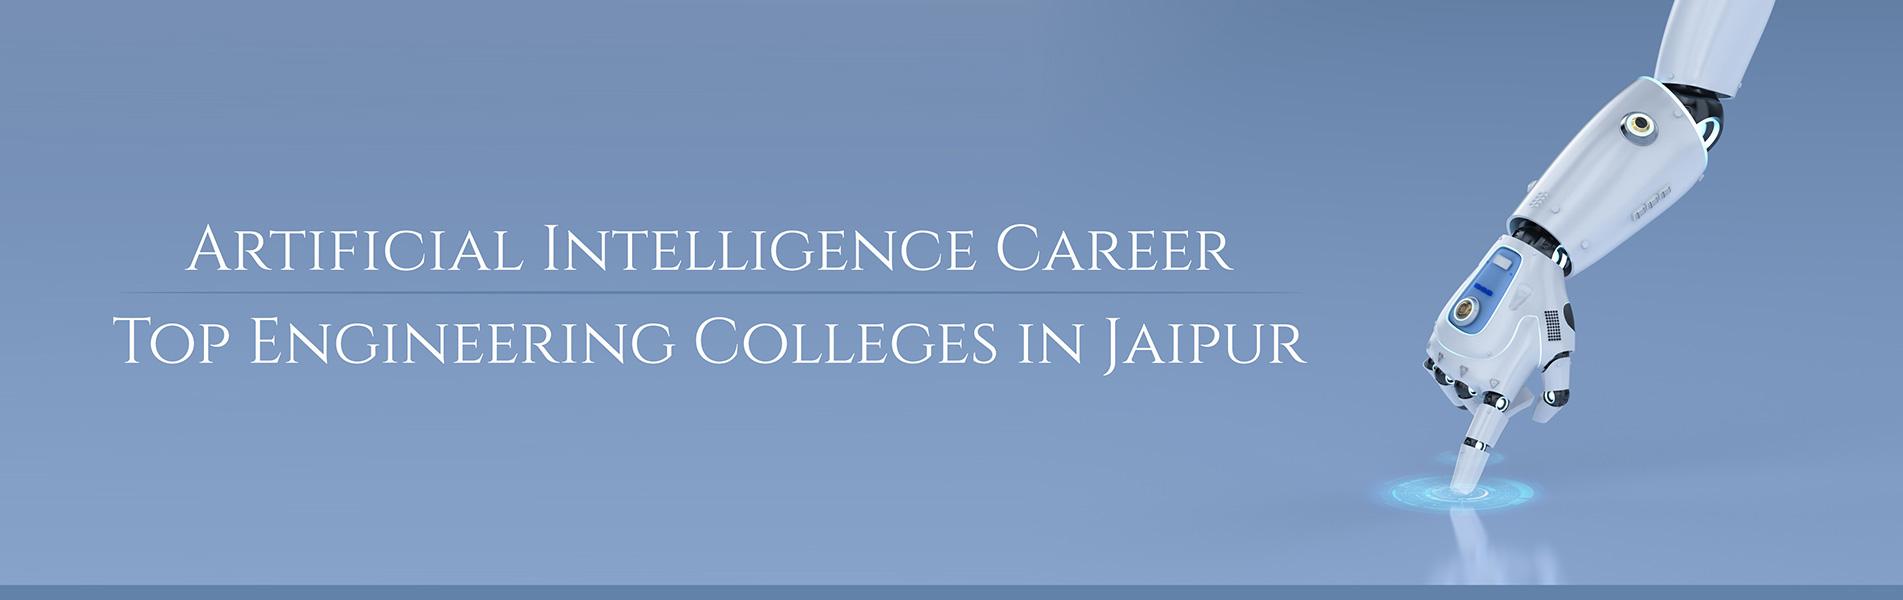 Artificial Intelligence, Career, Top Engineering Colleges in Jaipur